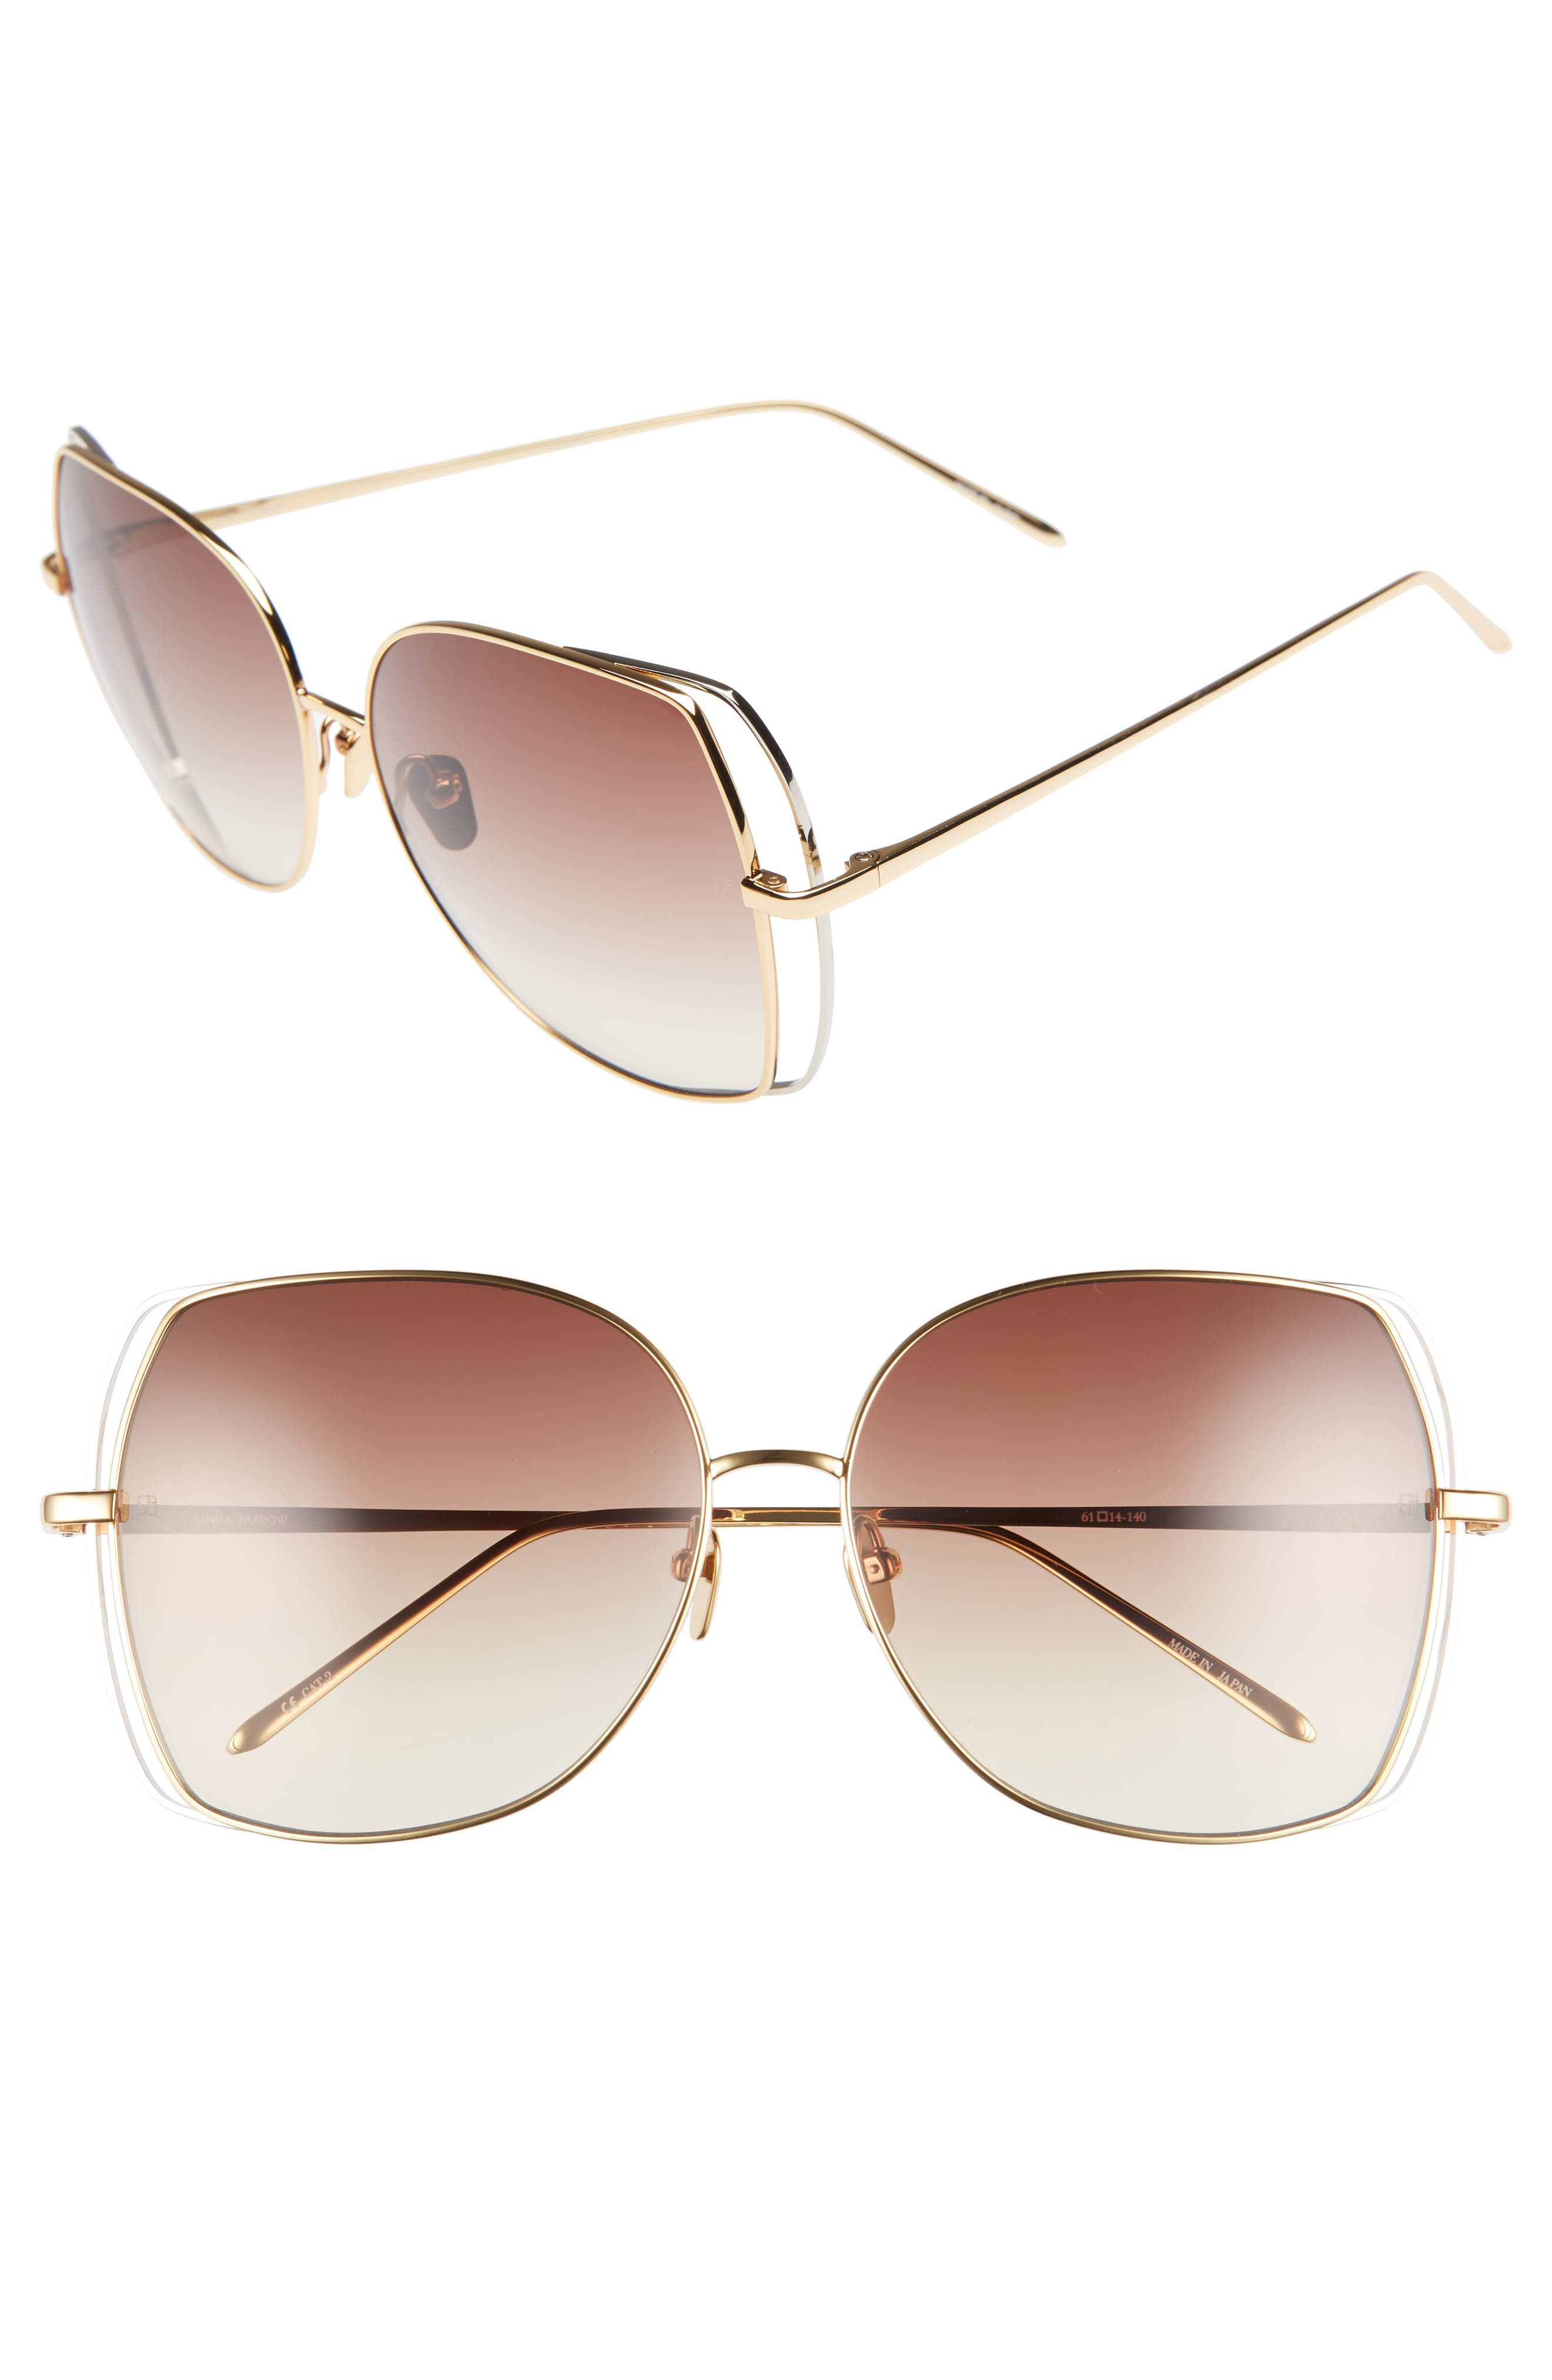 Linda Farrow 61mm Gradient Lens 18 Karat Gold Sunglasses